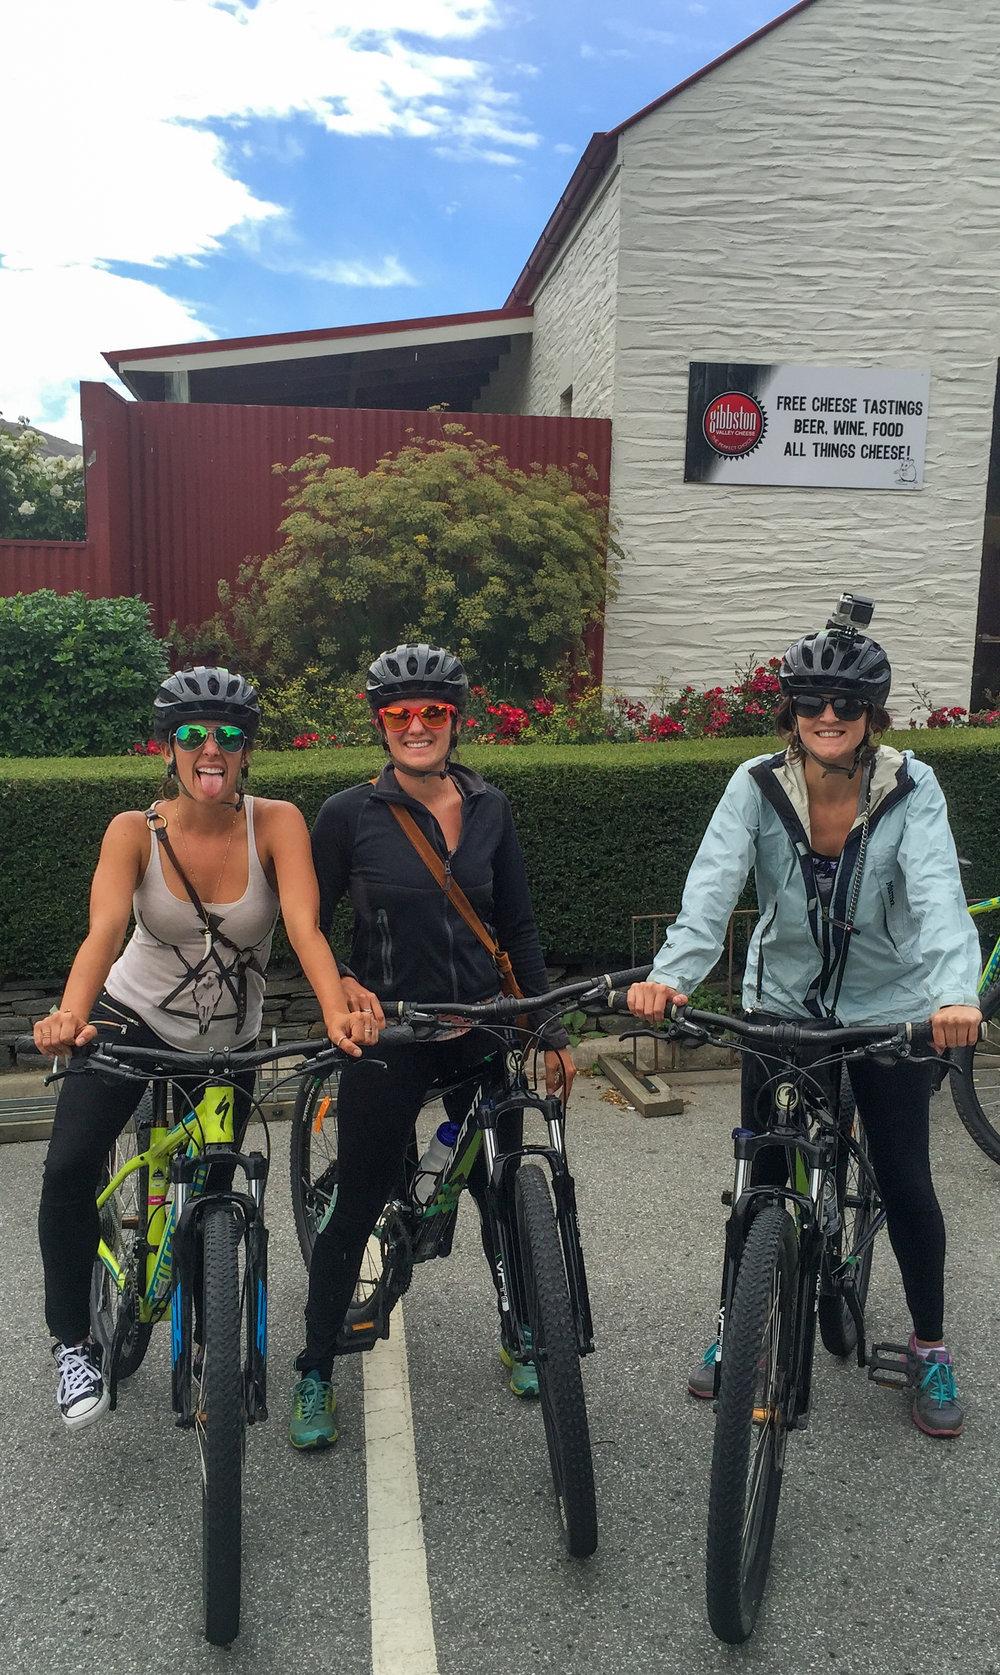 Gibbston Valley Bike Hire